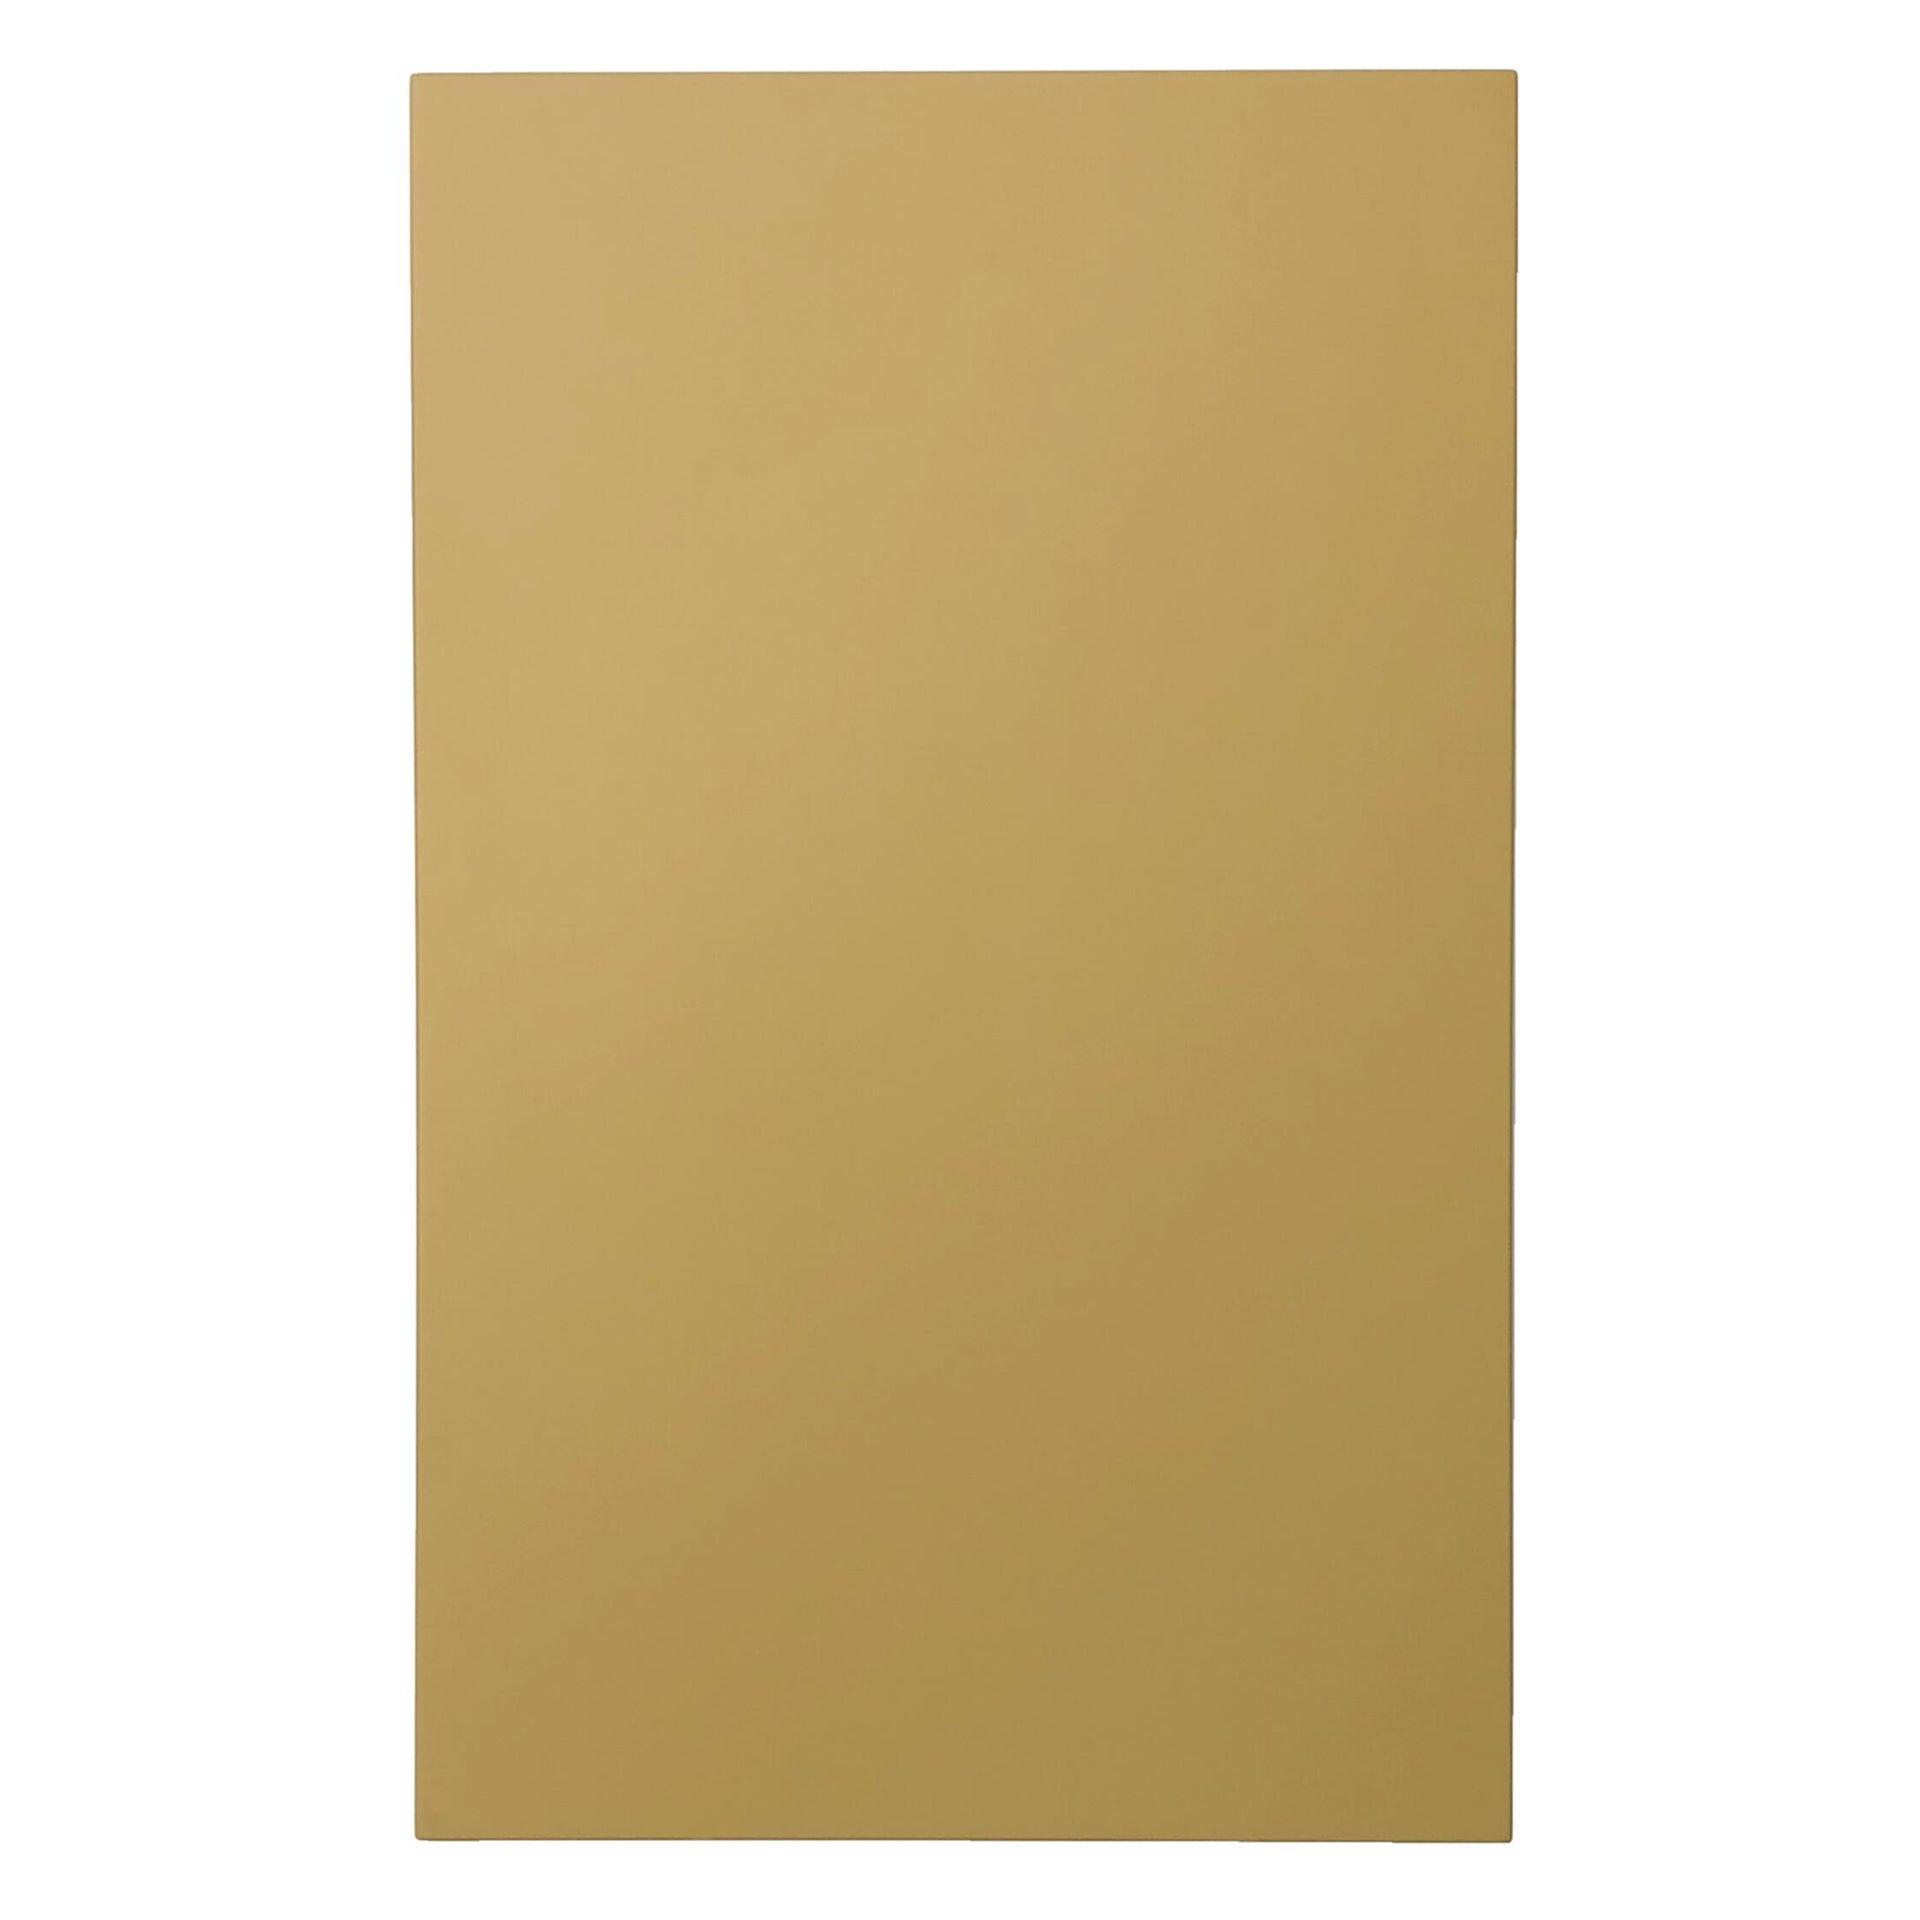 Anta DELINIA ID Parigi 76.5 x 44.7 giallo ocra